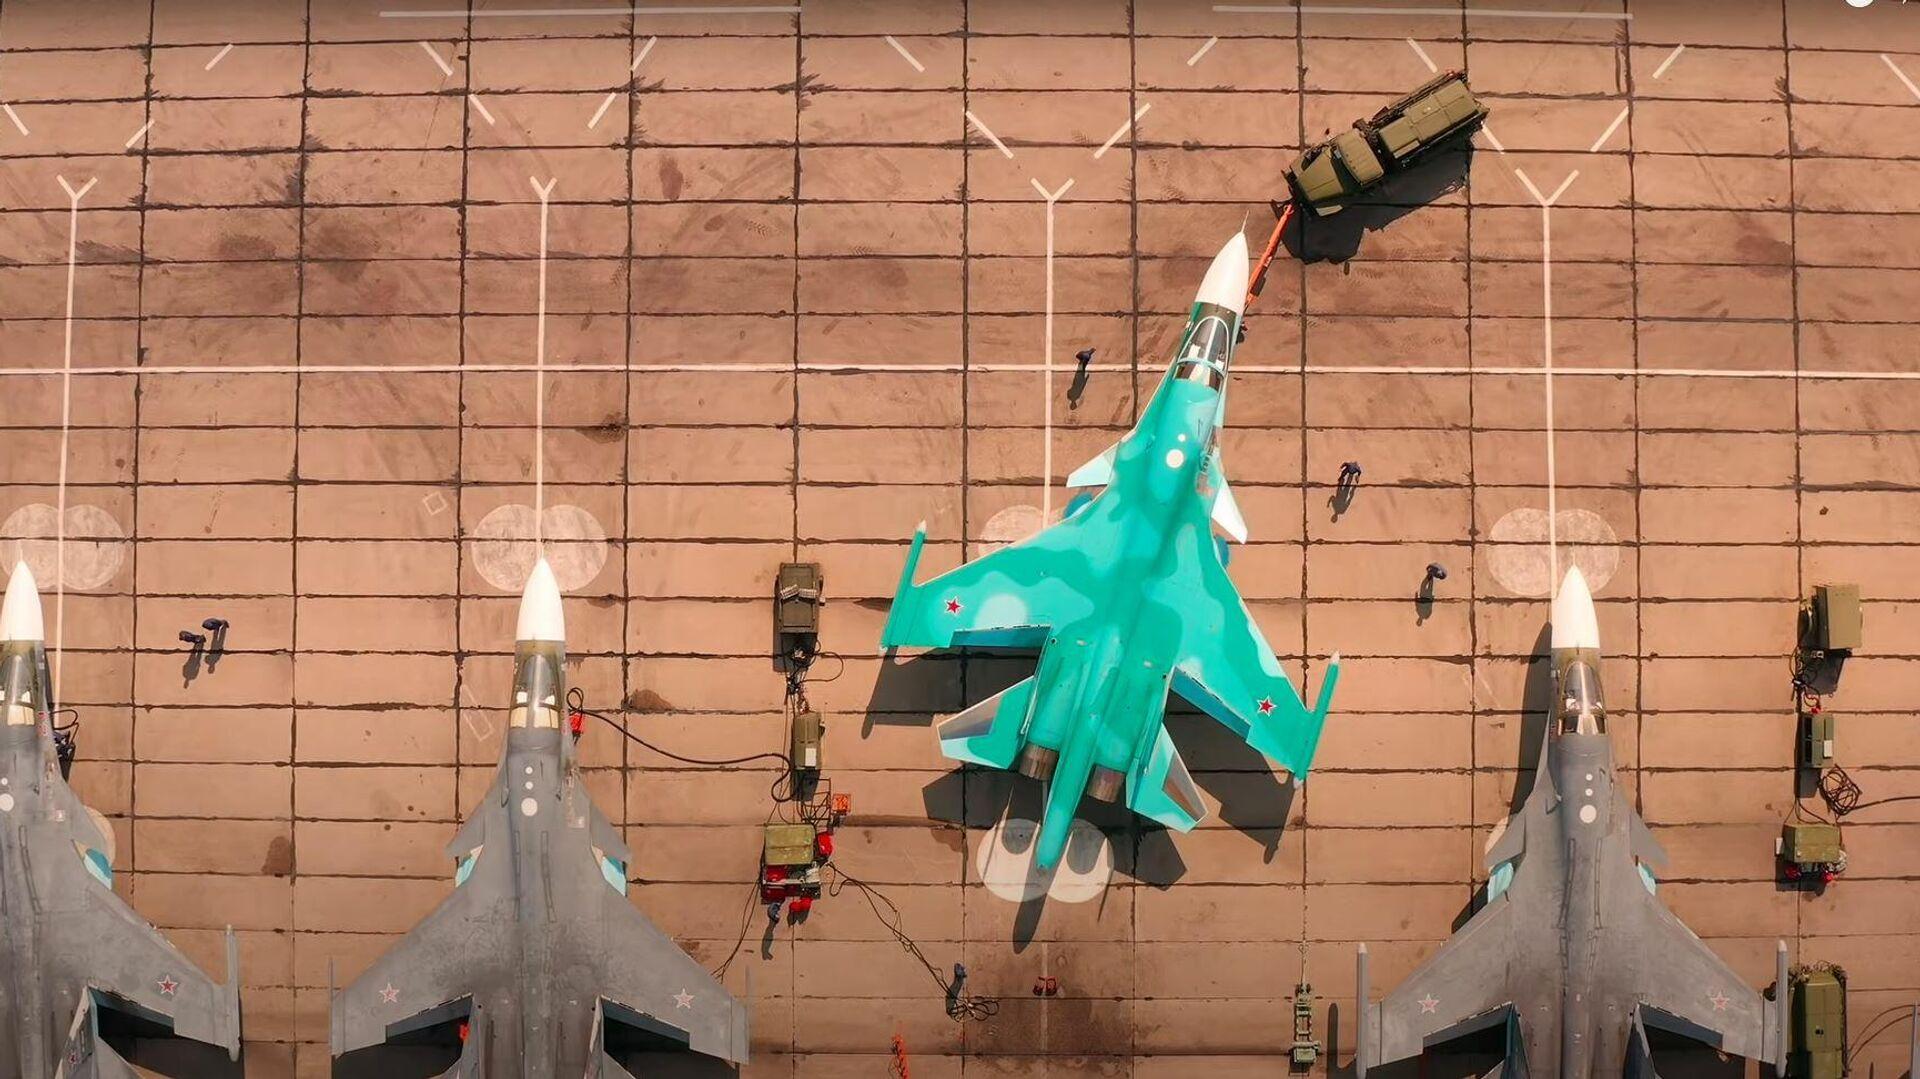 Caccia russo Su-34 - Sputnik Italia, 1920, 12.09.2021